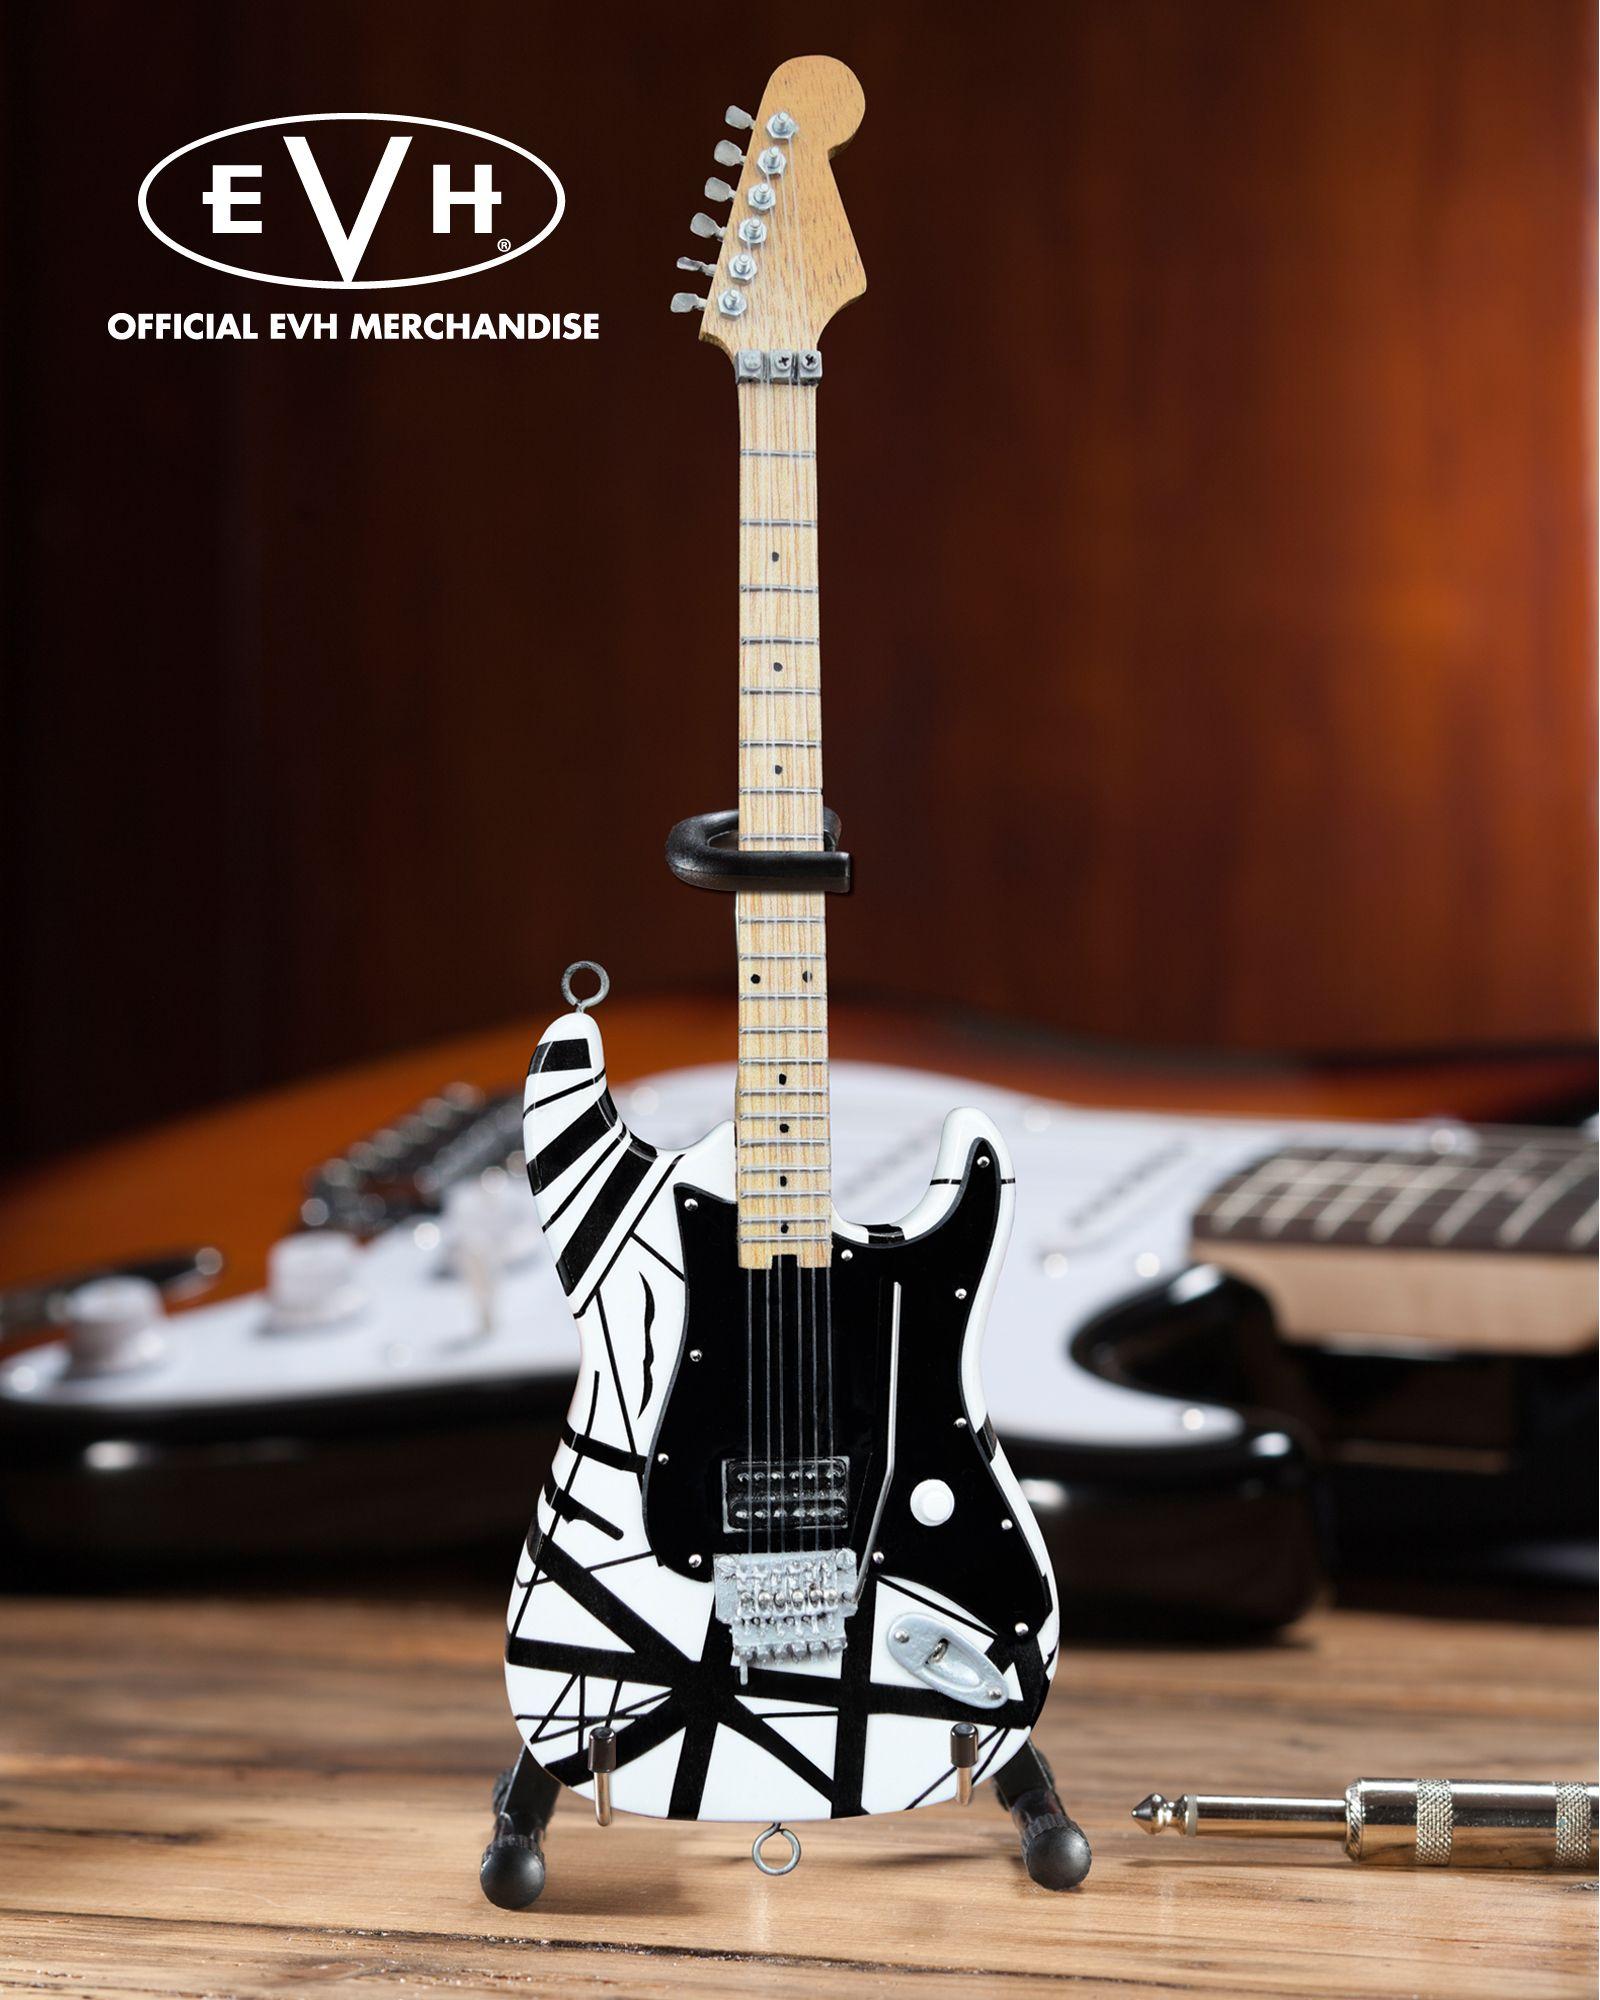 Evh Black White Vh1 Eddie Van Halen Mini Guitar Replica Collectible Officially Licensed Eddie Van Halen Van Halen Guitar